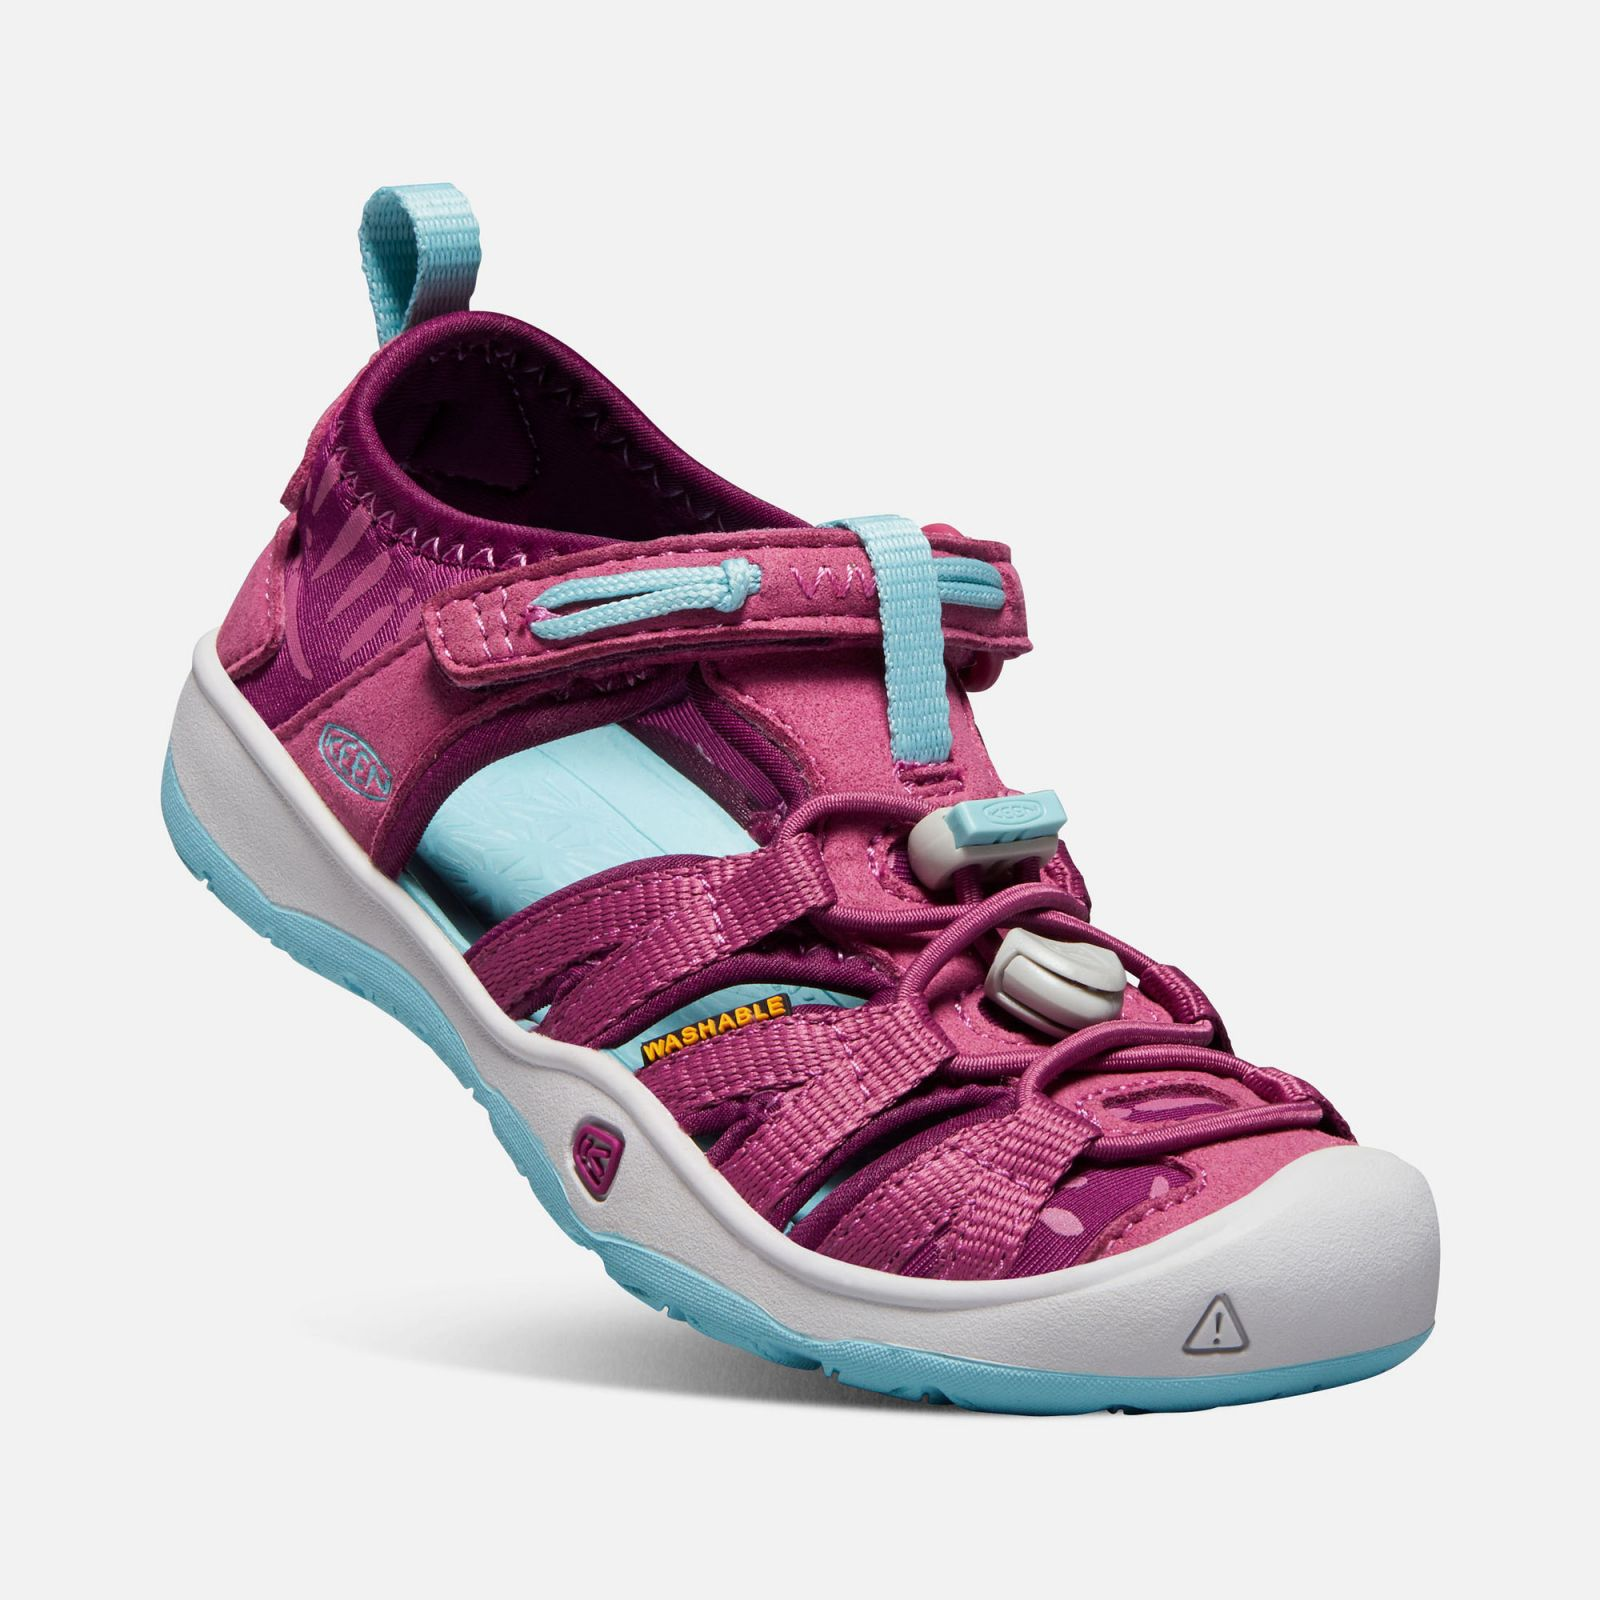 KEEN Moxie Sandal JR Red violet / Pastel turquoise Dívčí sandál